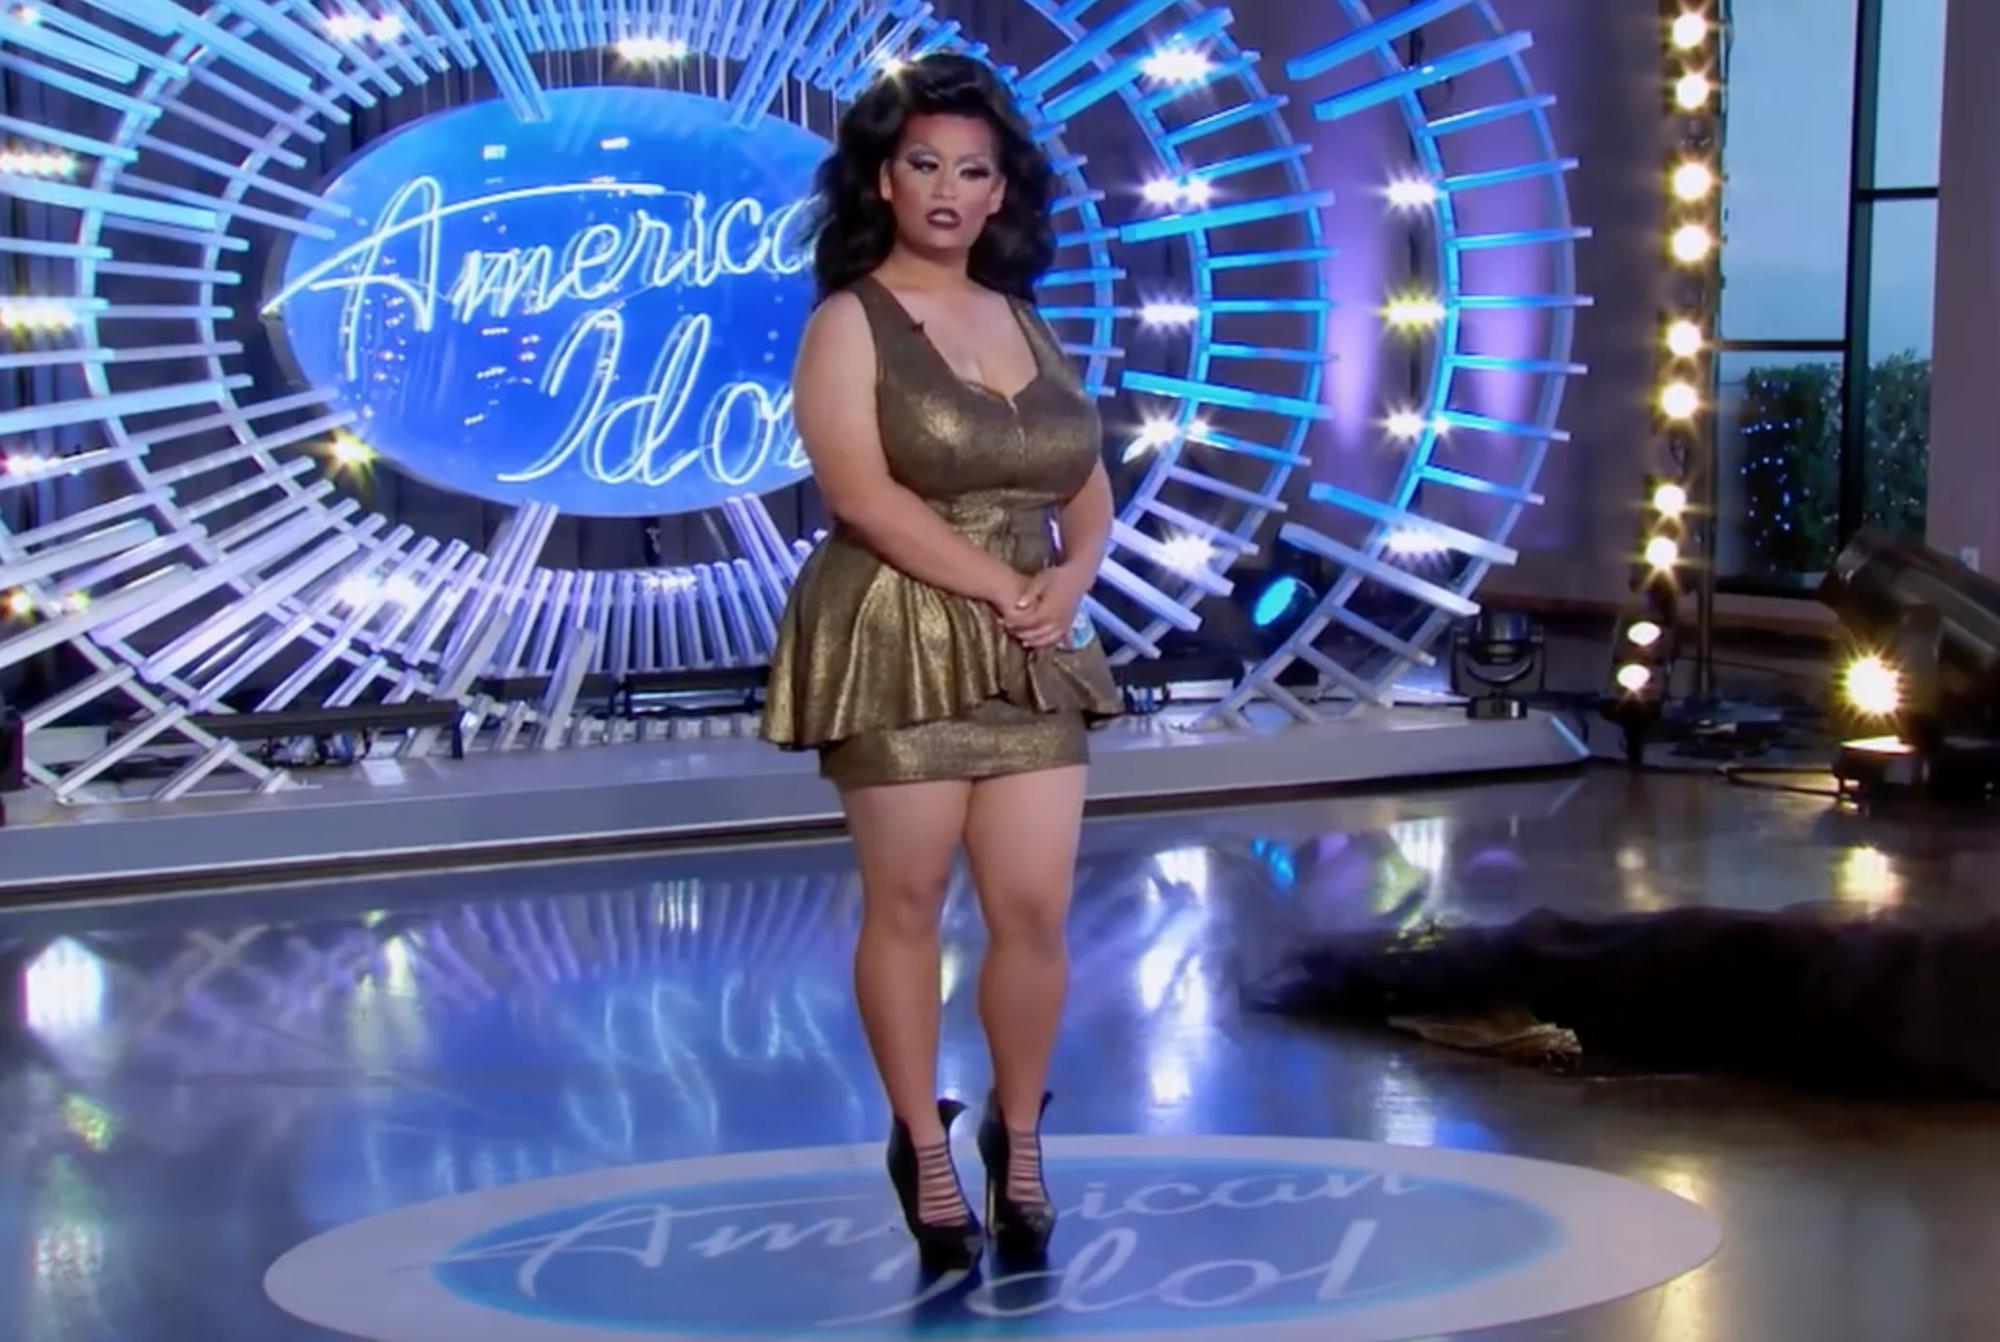 Katy perry's sexiest american idol looks